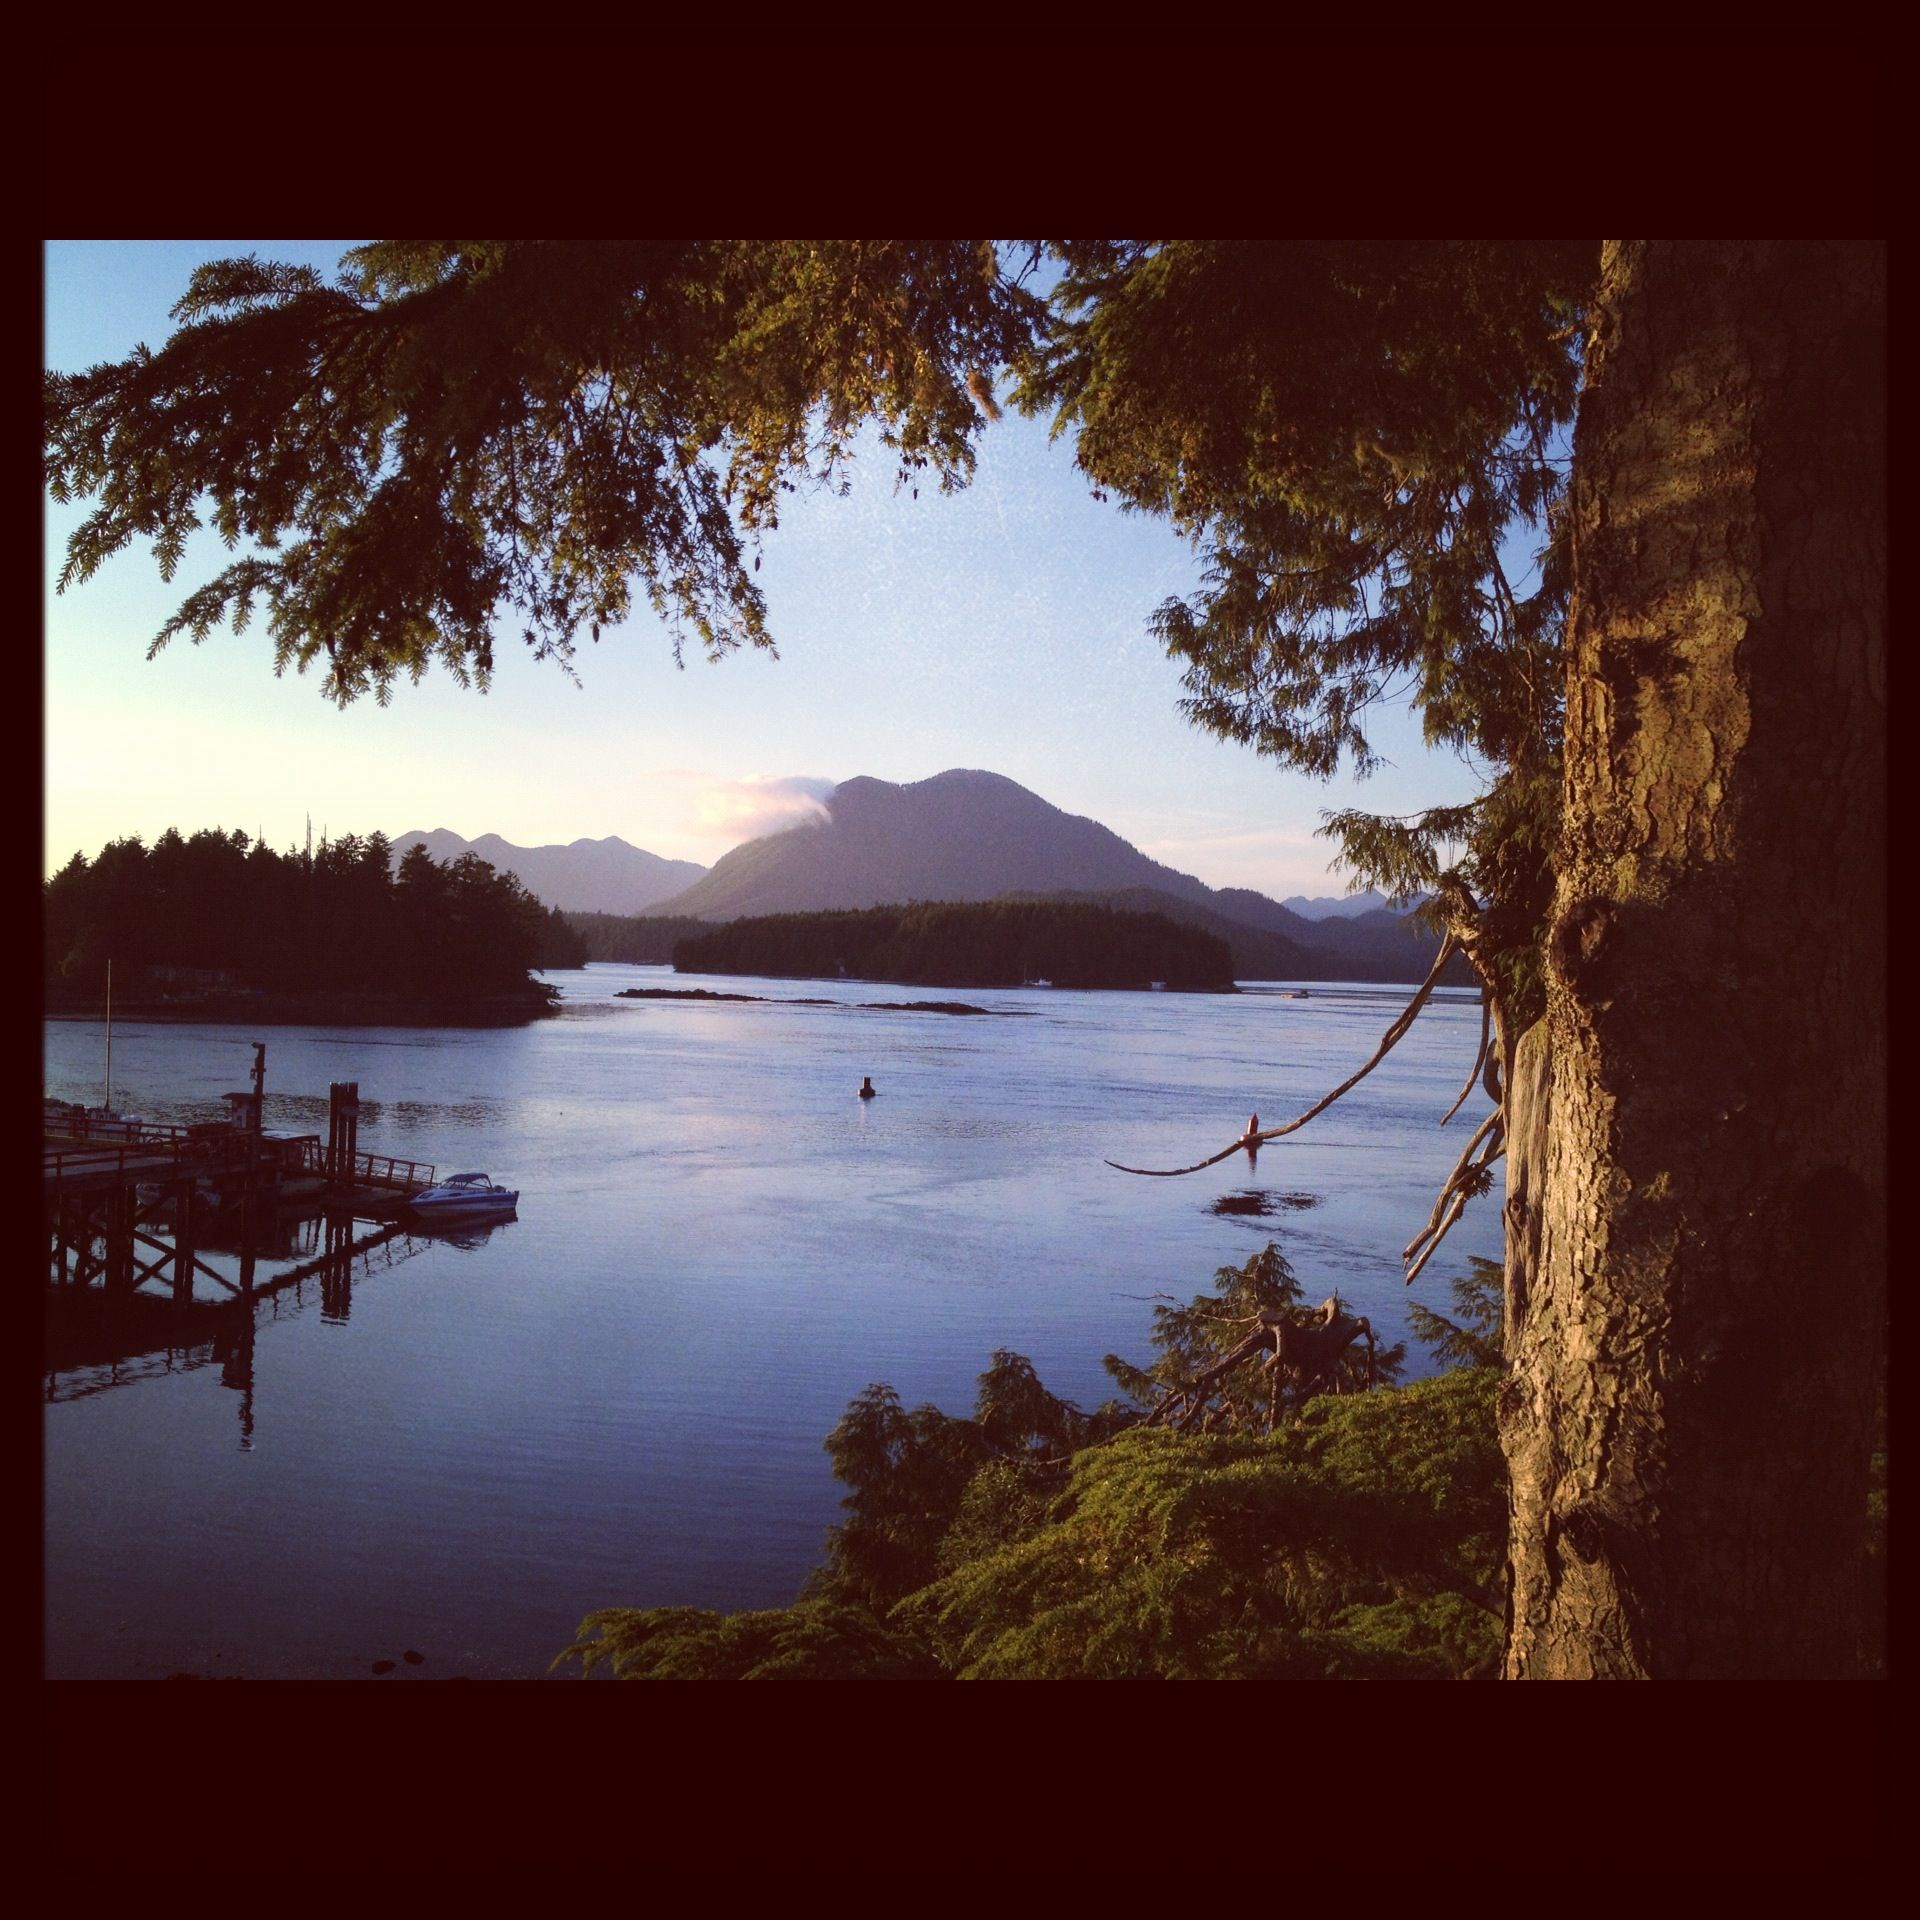 Beaches Vancouver Island: Our Beautiful Home~Tofino